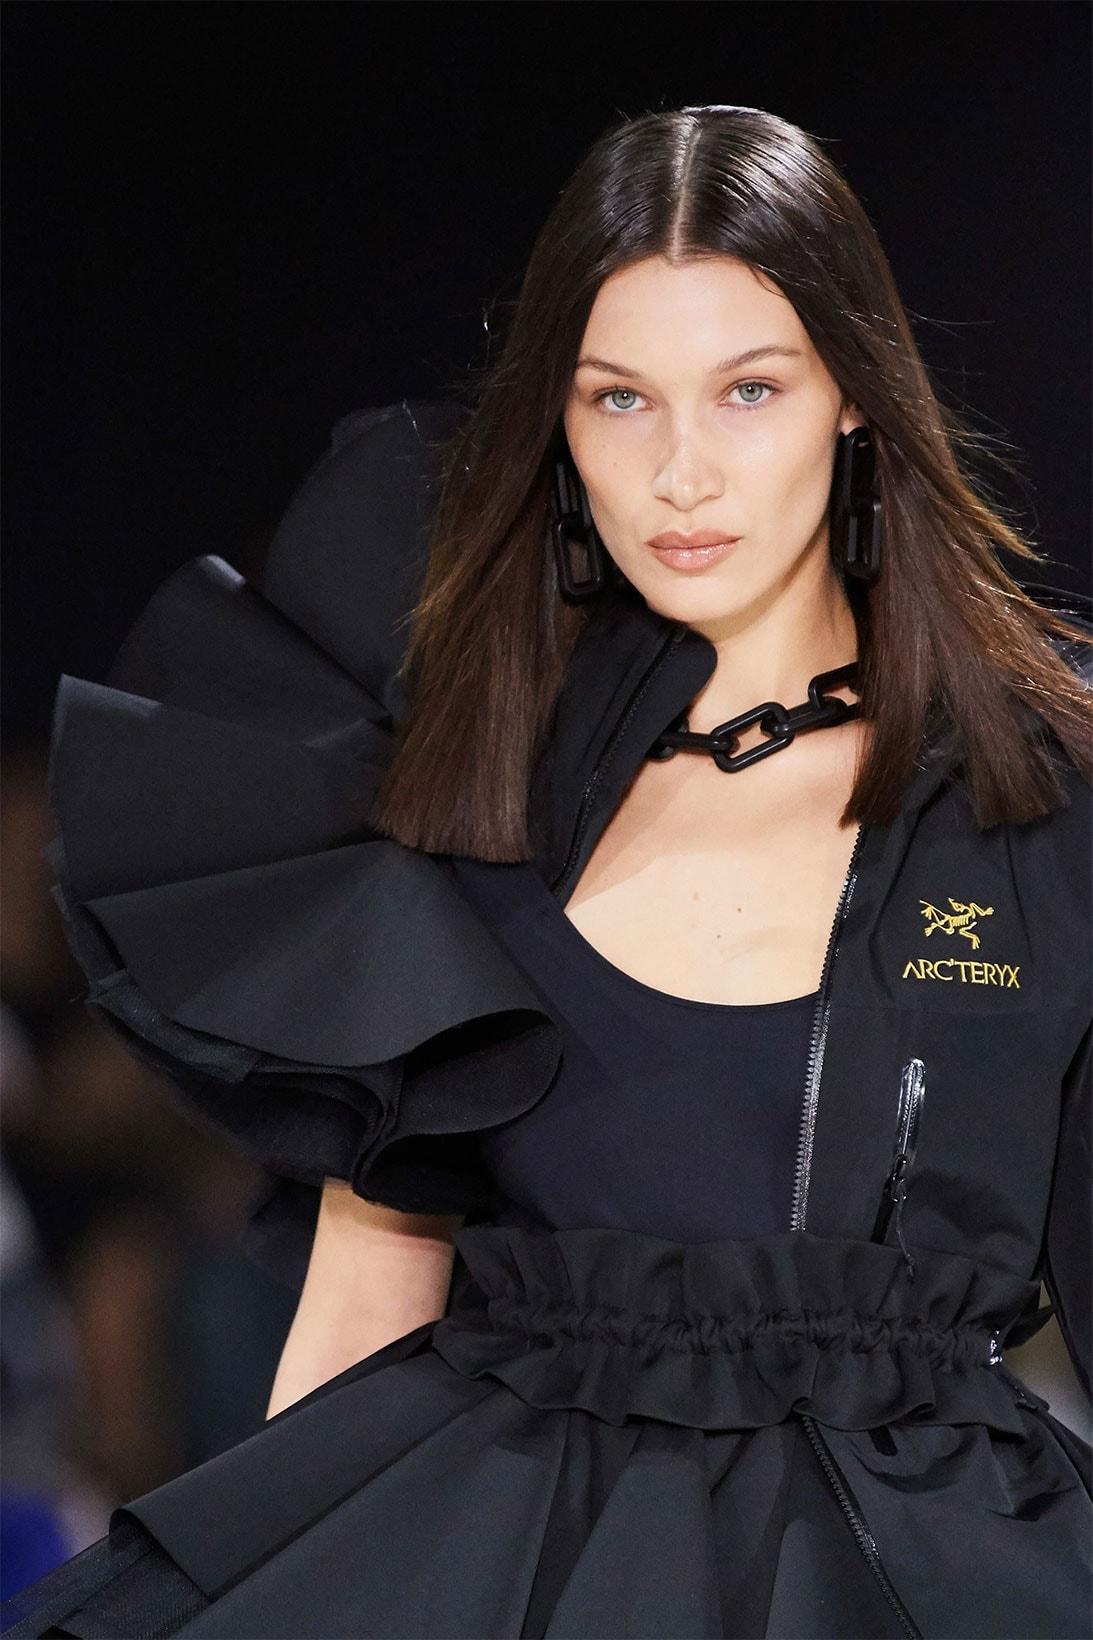 off-white virgil abloh fall winter paris fashion week pfw runway nike air jordan 4 collaboration gigi bella hadid